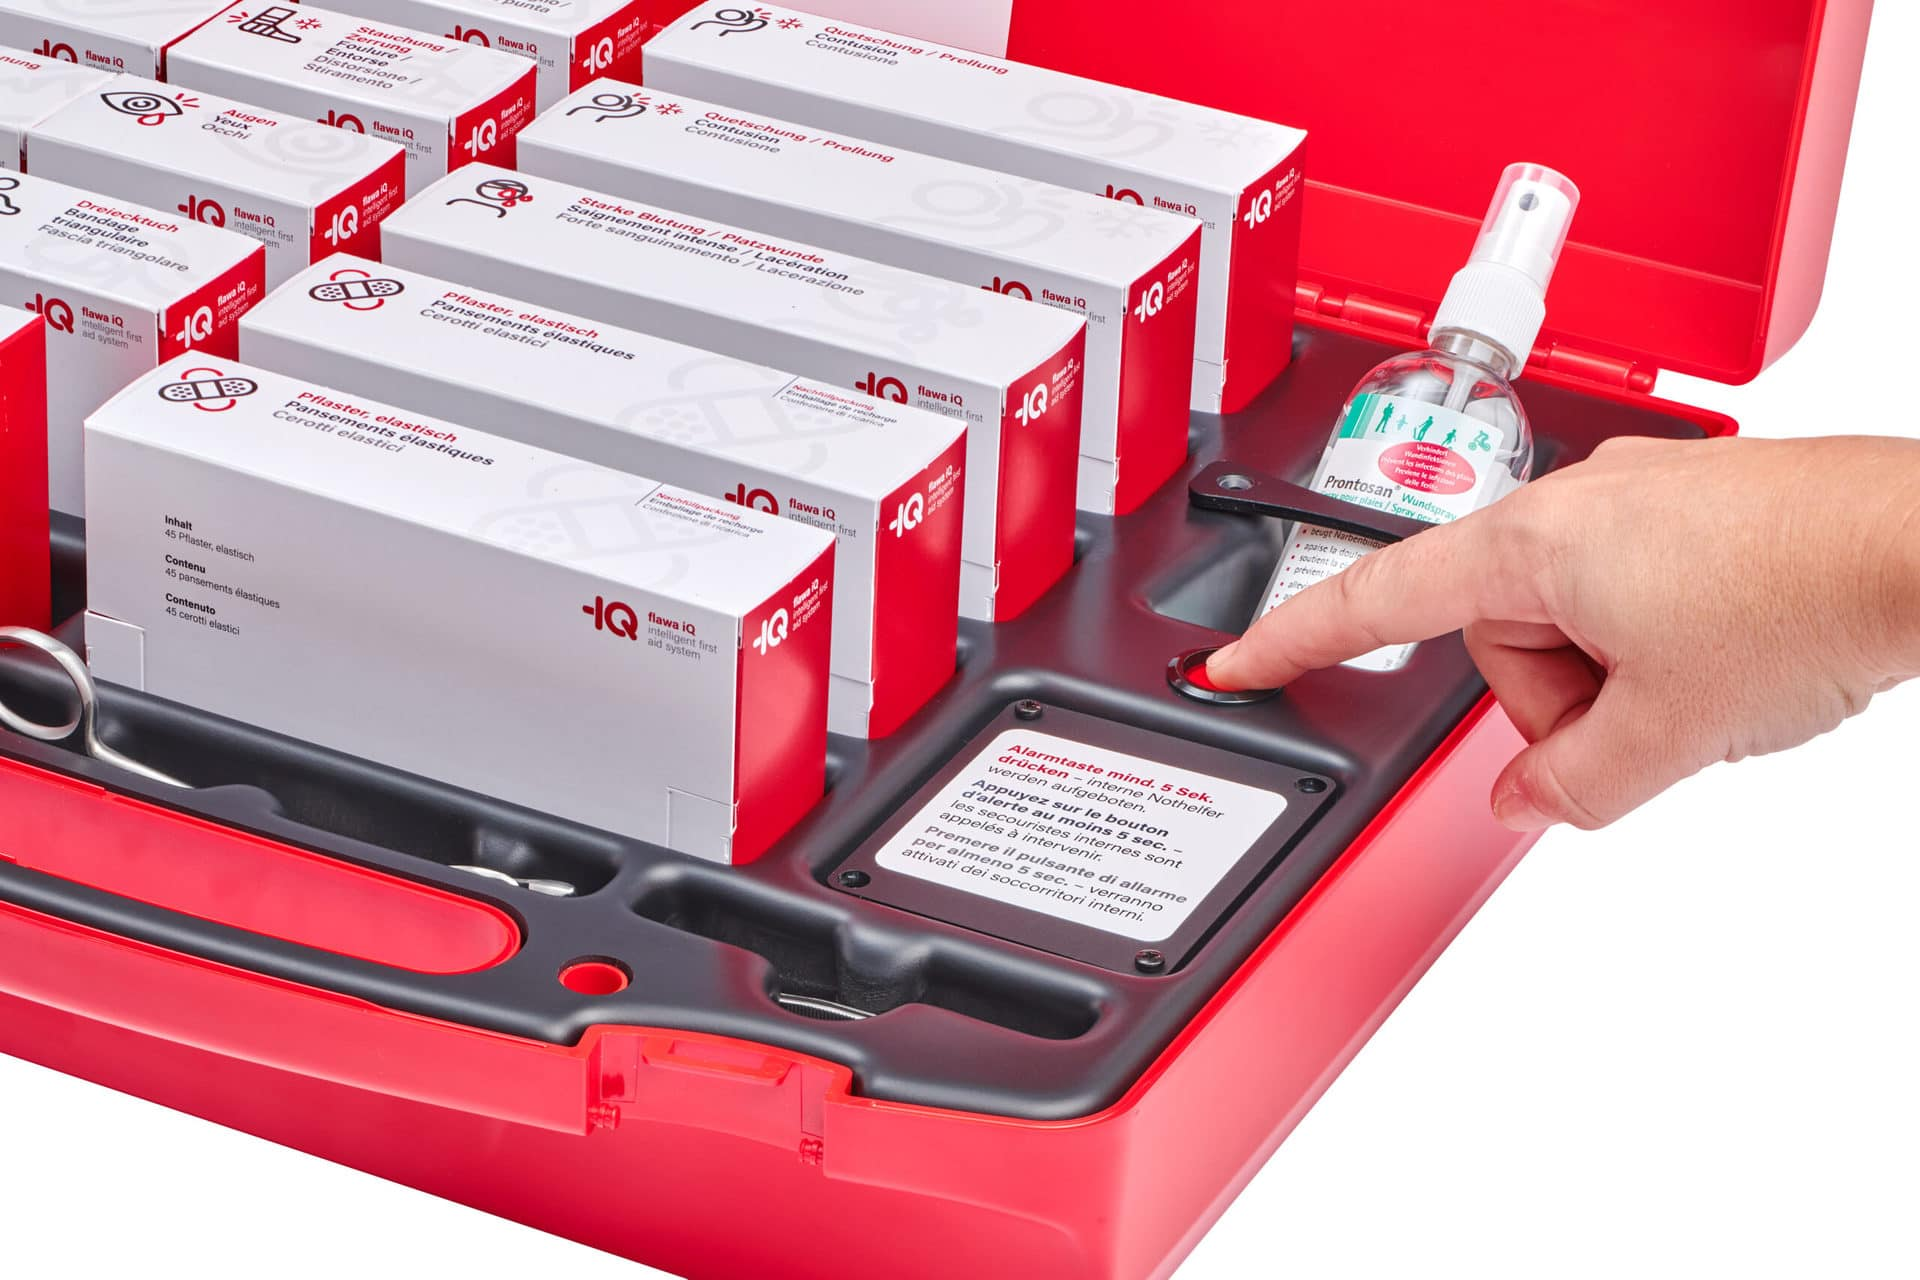 Intelligente Erste-Hilfe-Apotheke mit integrierter Alarmfunktion